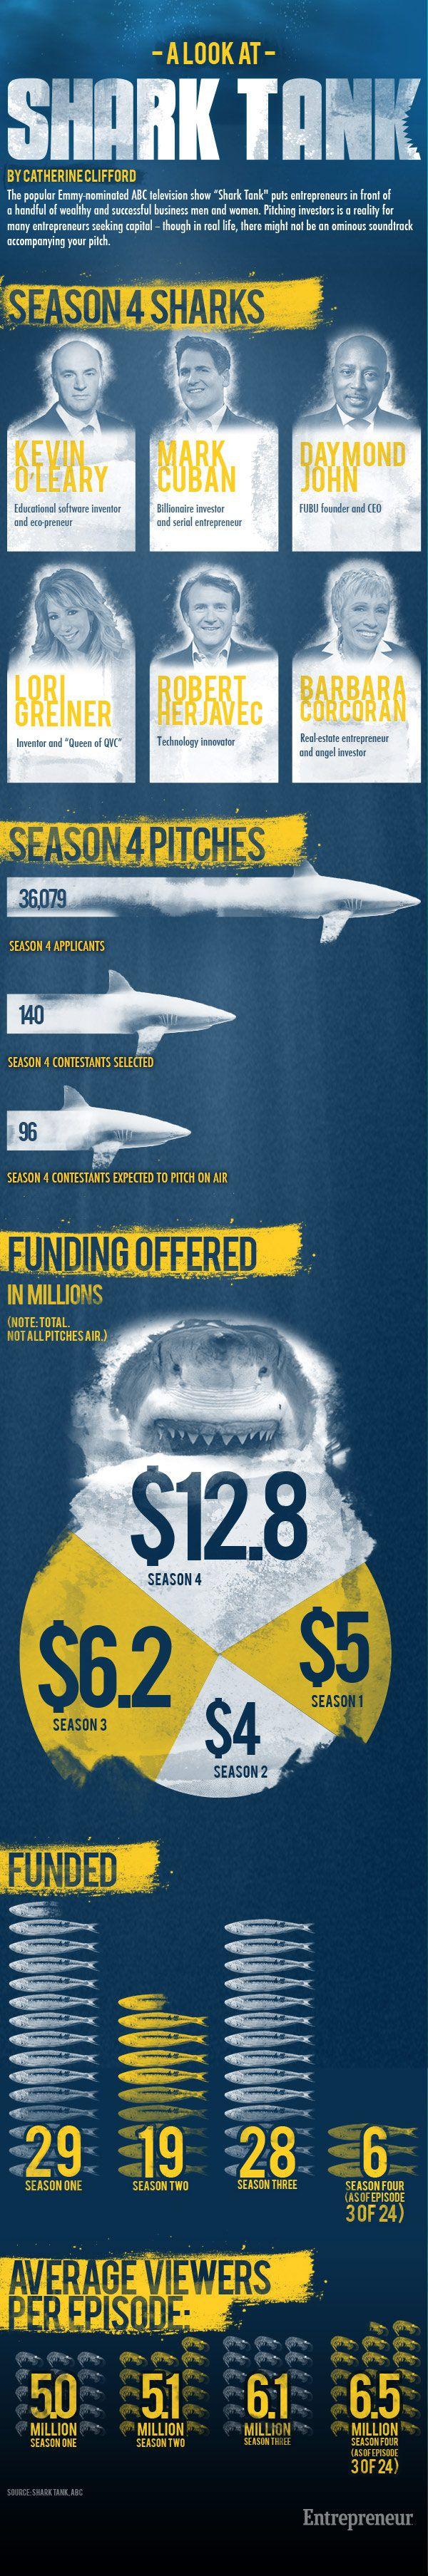 How Shark Tank is Popularizing Entrepreneurship    http://blogs.payscale.com/salary_report_kris_cowan/2012/12/how-shark-tank-is-popularizing-entrepreneurship-infographic.html